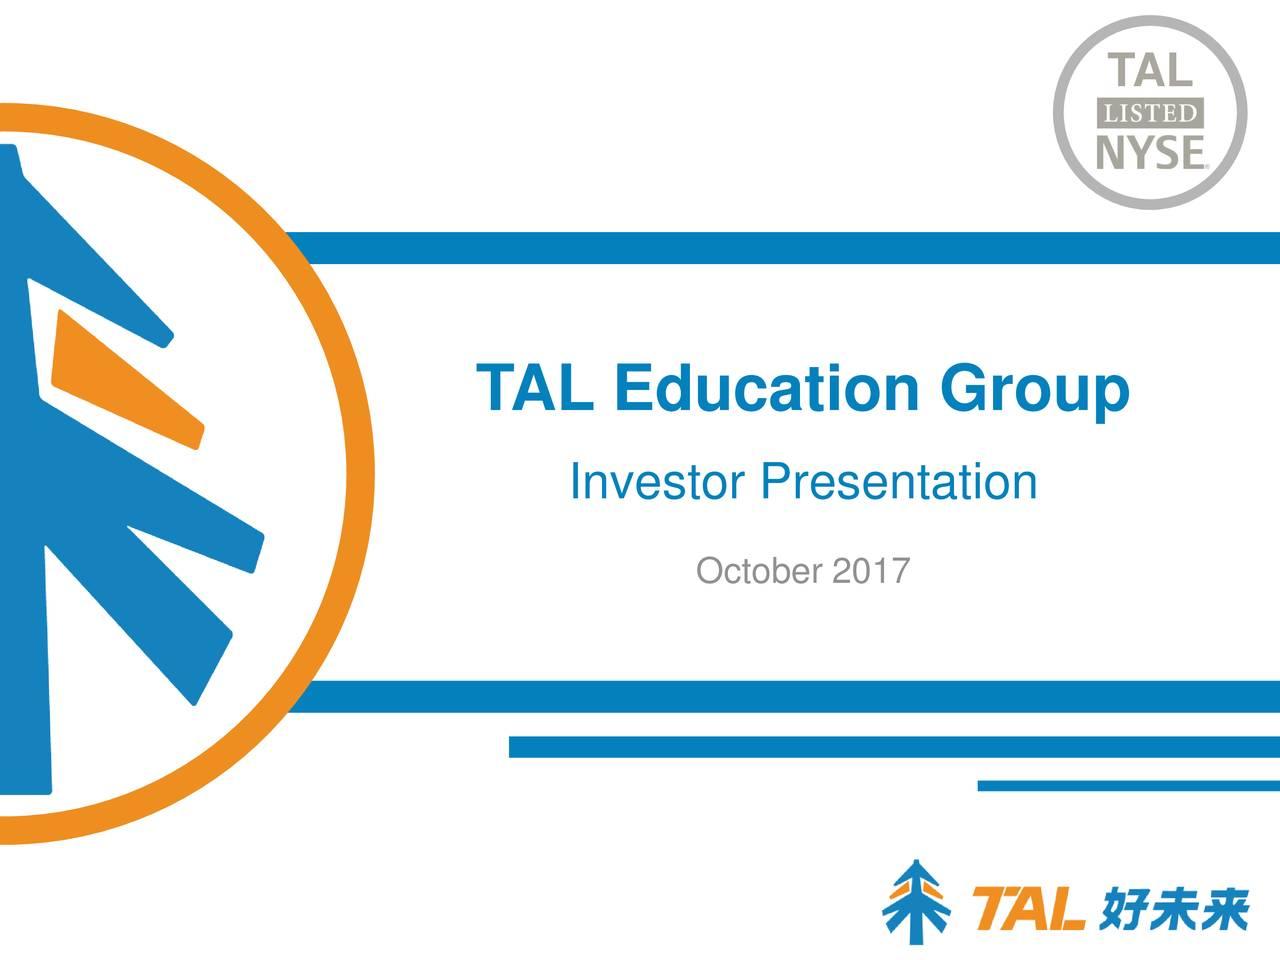 Education Group Investor Presentation October 2017